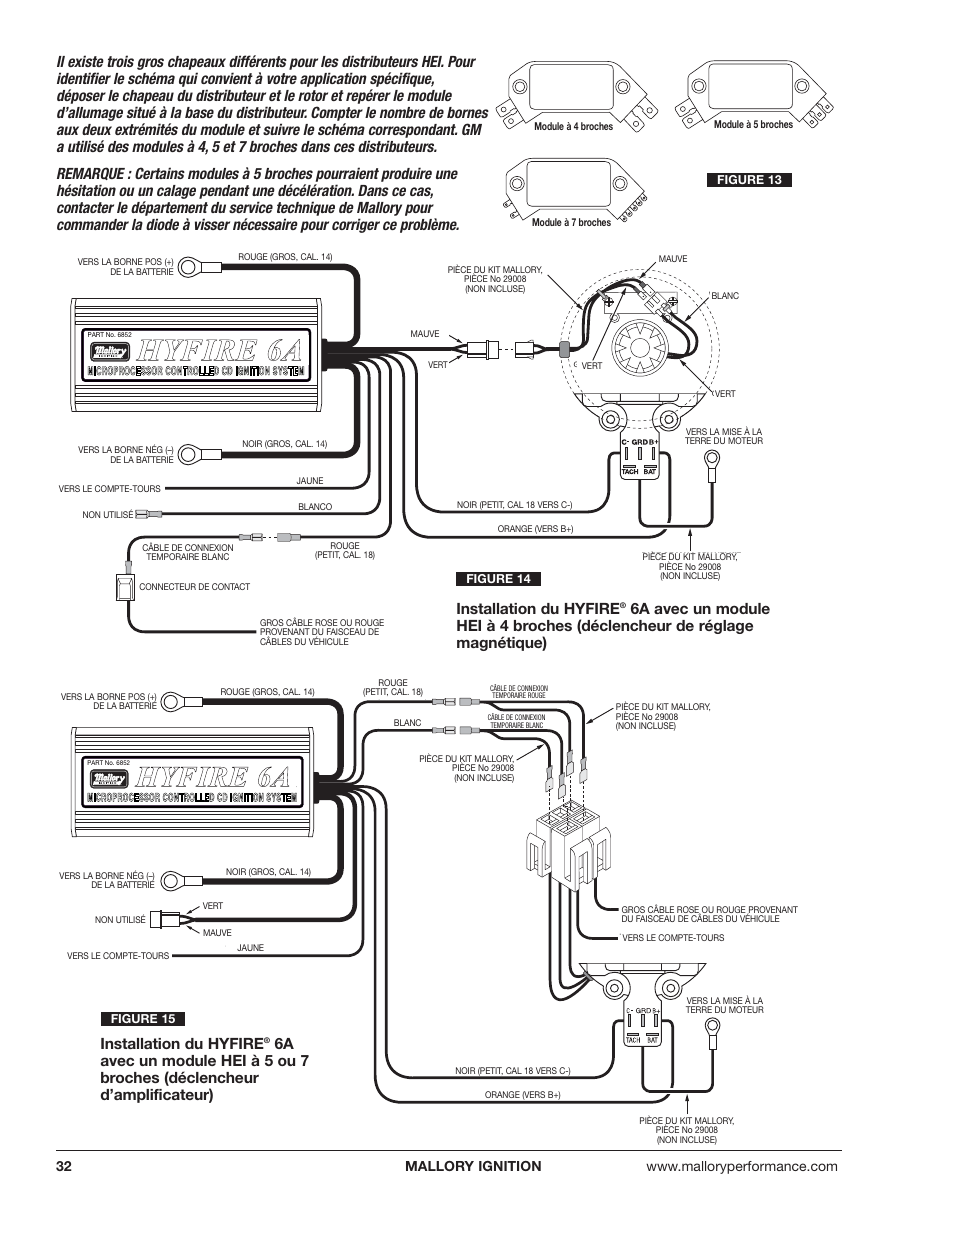 medium resolution of hhy yf fiir re e 6 6a a installation du hyfire mallory ignition mallory